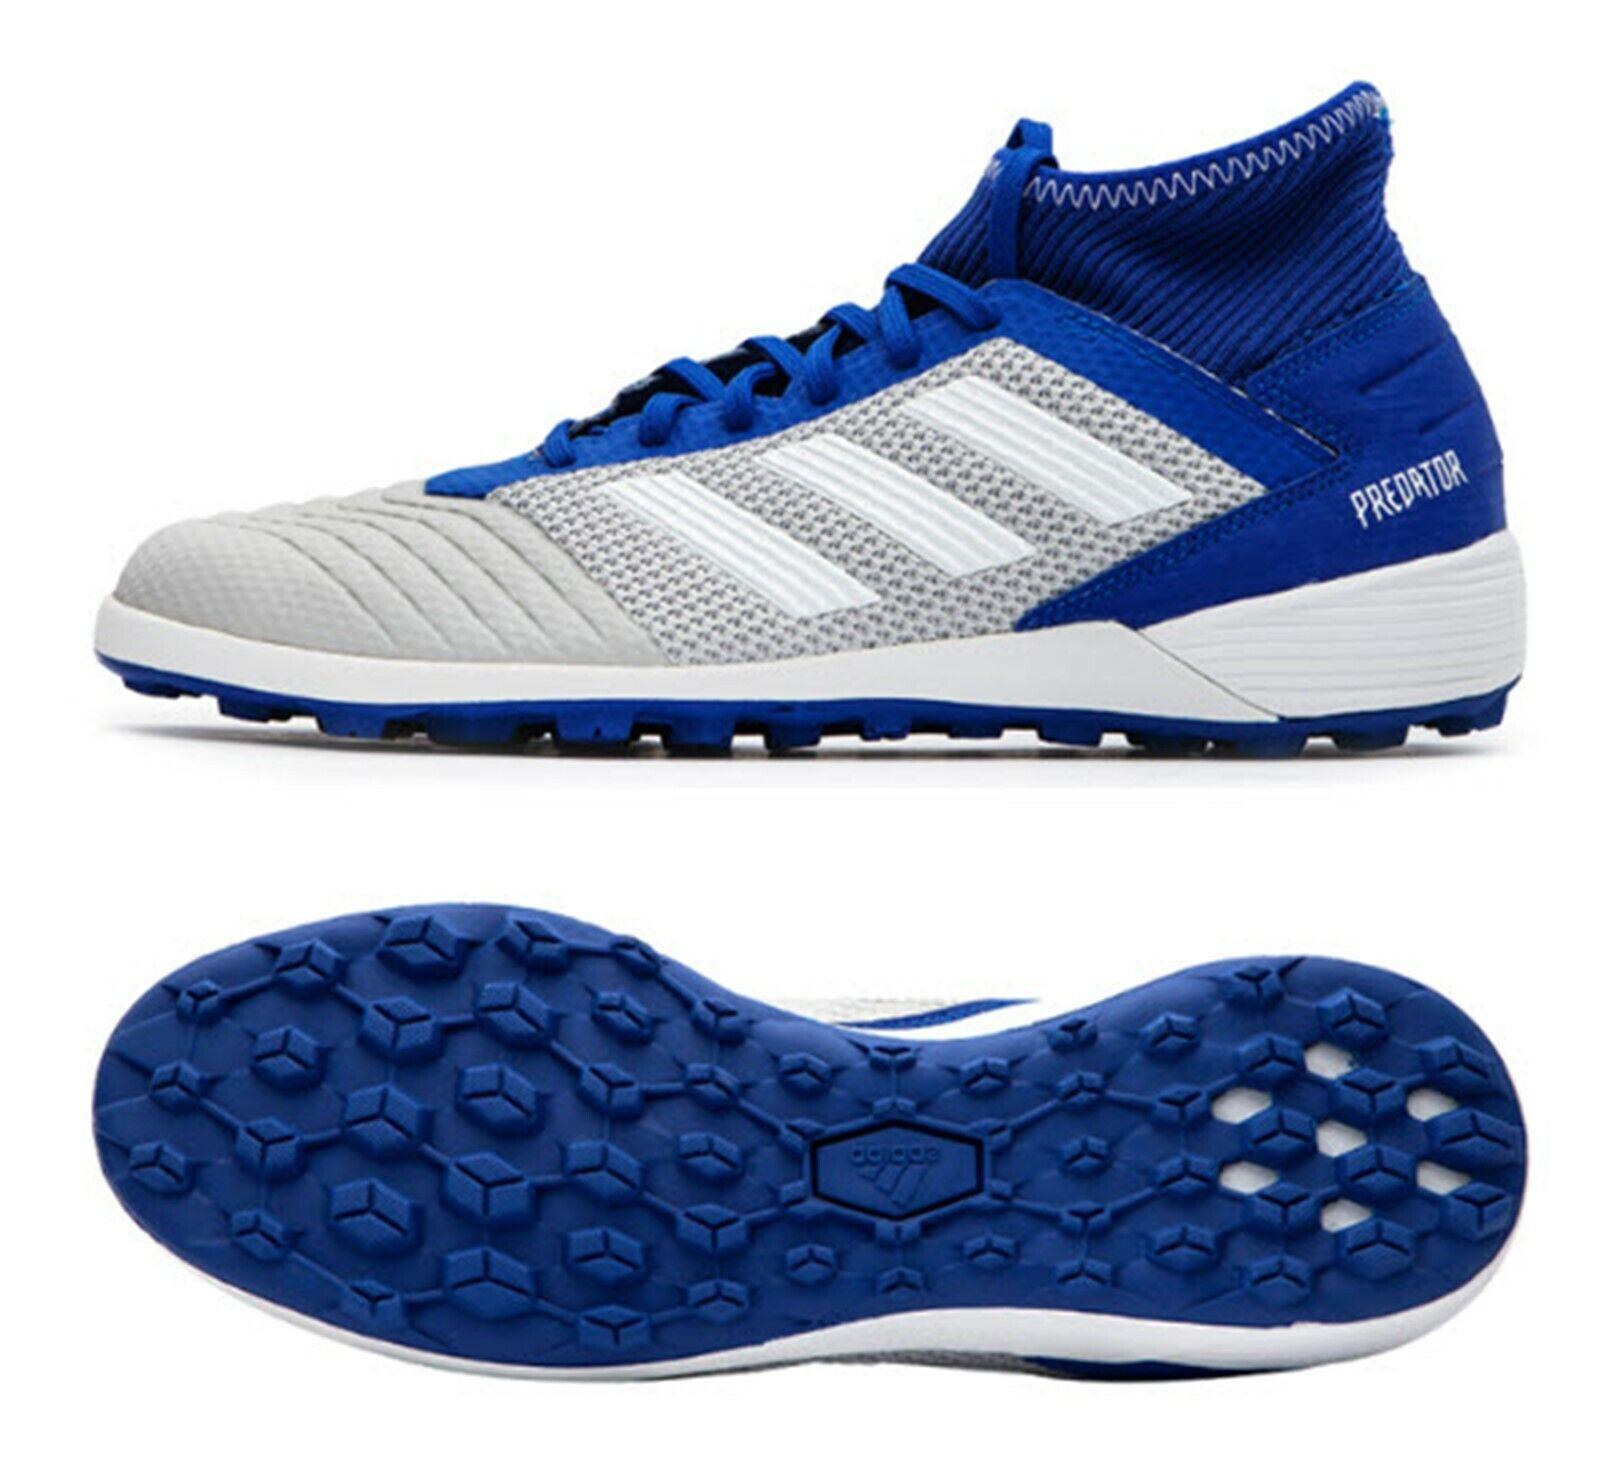 Adidas Men Protator 19.3 TF Cleats Futsal Blau Soccer schuhe Stiefel Spike BC0555